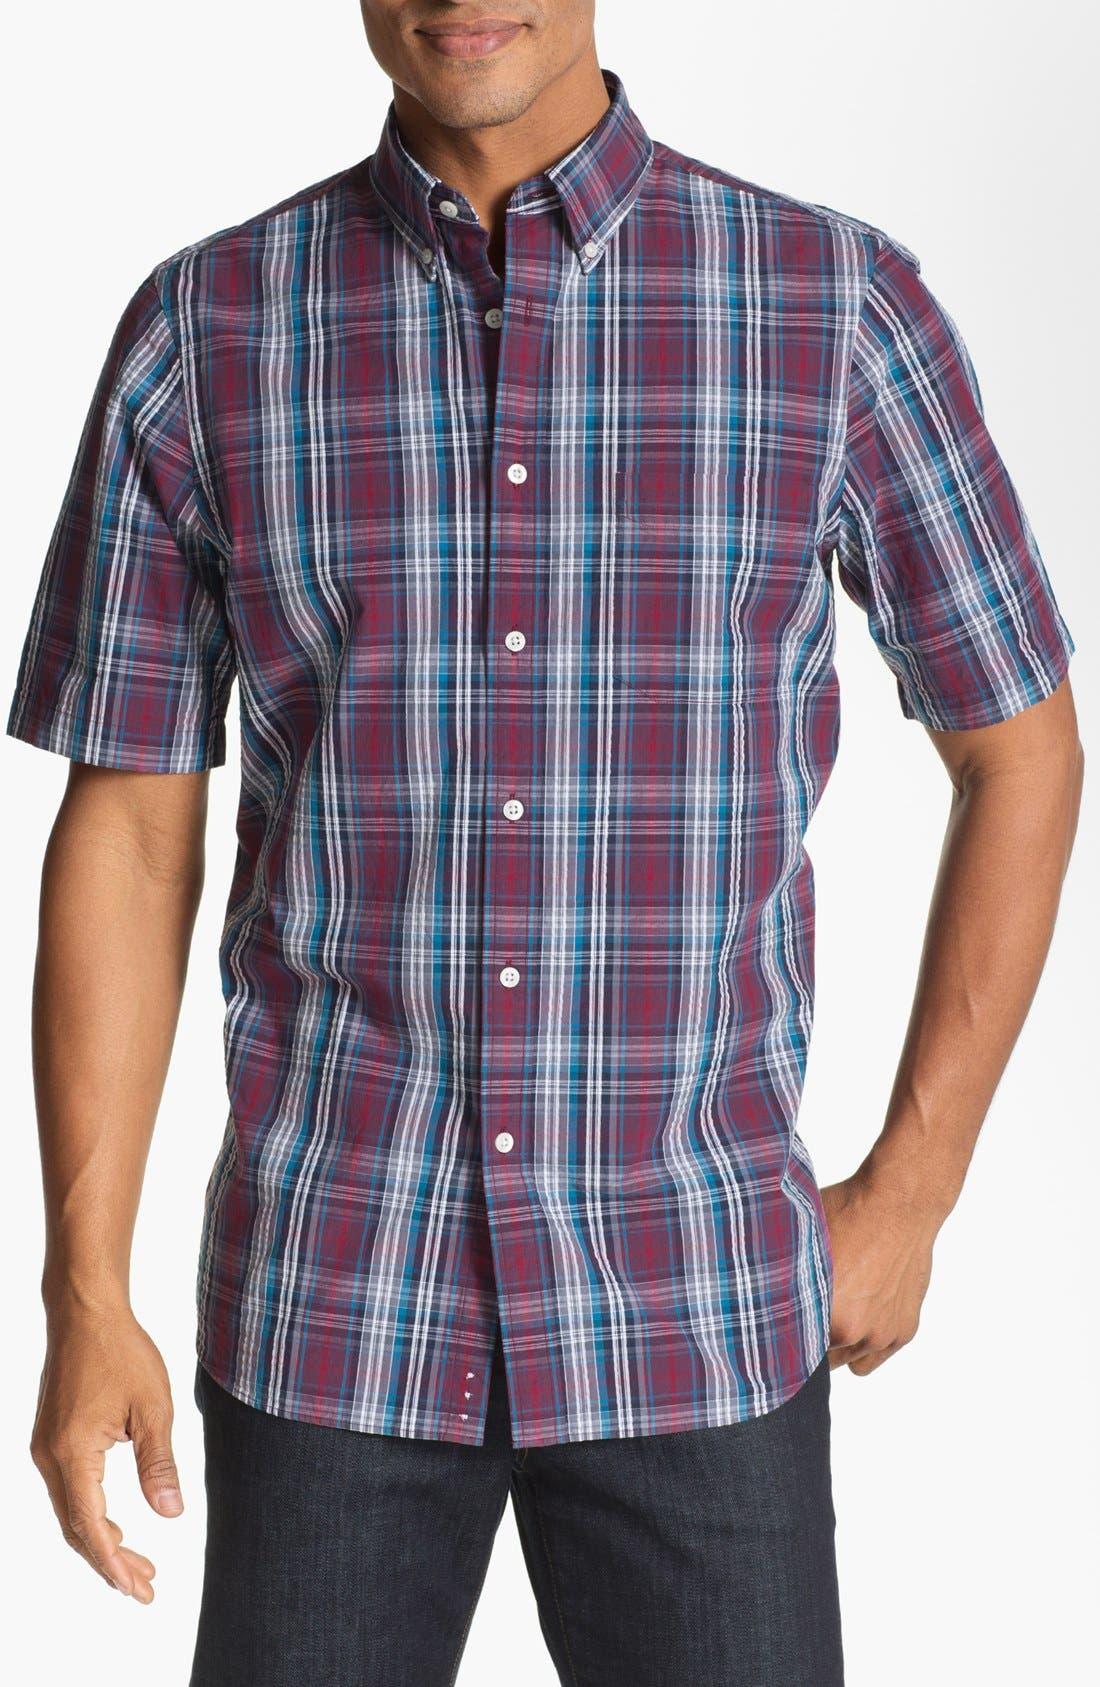 Main Image - Nordstrom Regular Fit Seersucker Sport Shirt